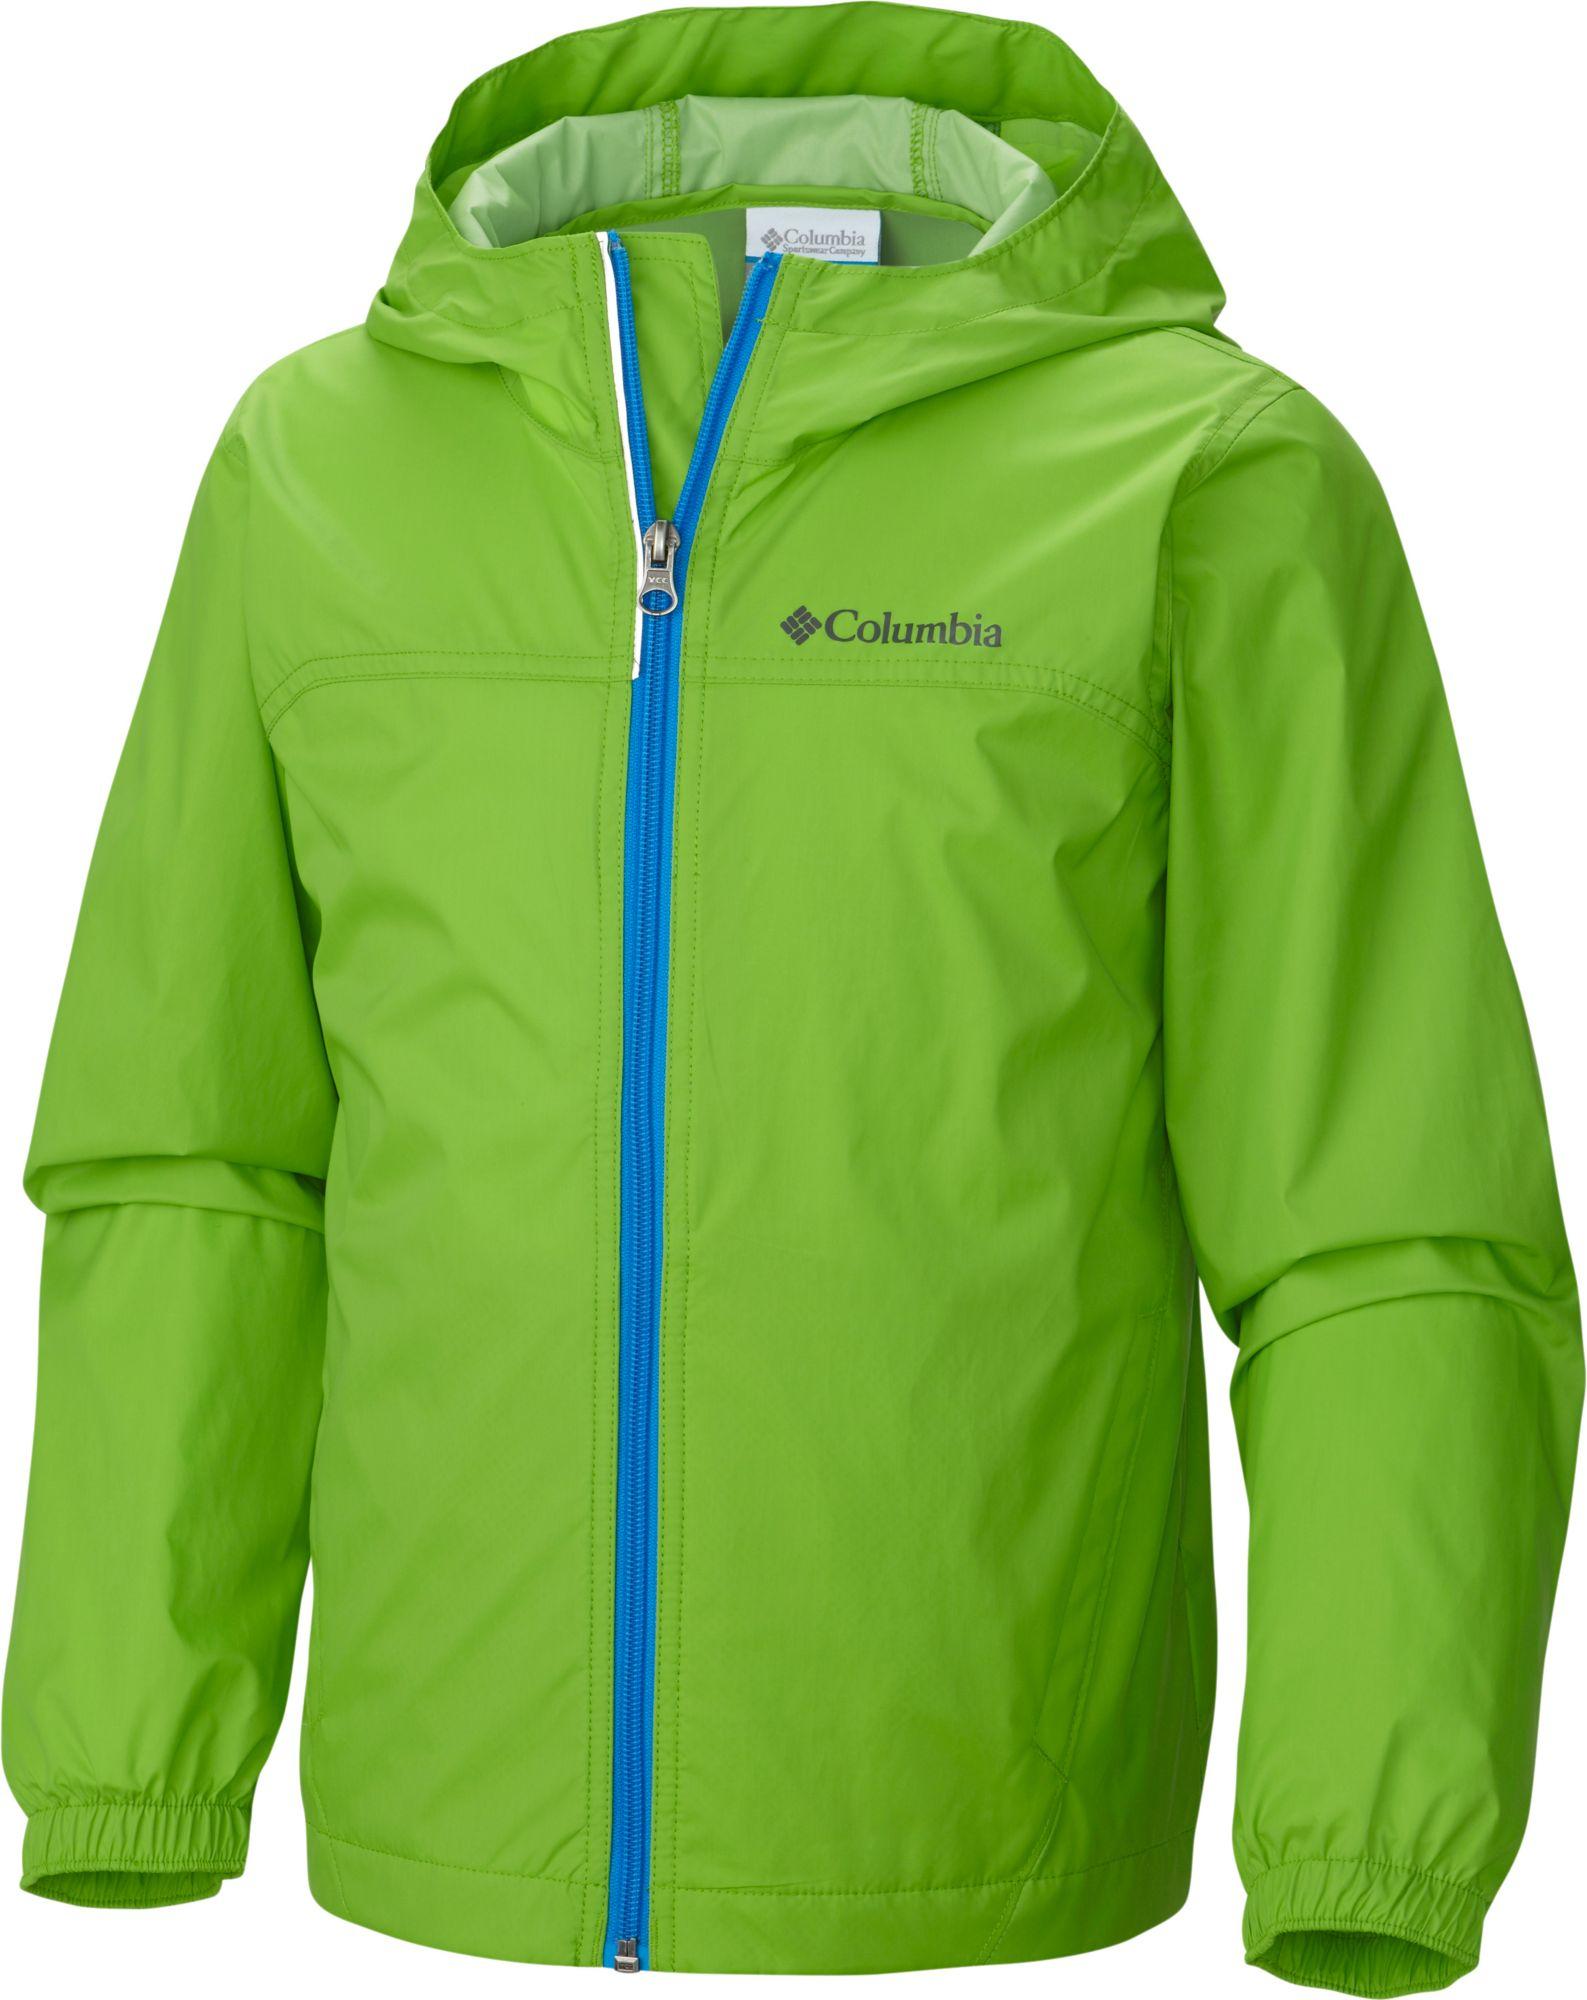 columbia toddler boys glennaker rain jacket dick s sporting goods #2: 15cmbttdbglnnkrrnapo cyber green is